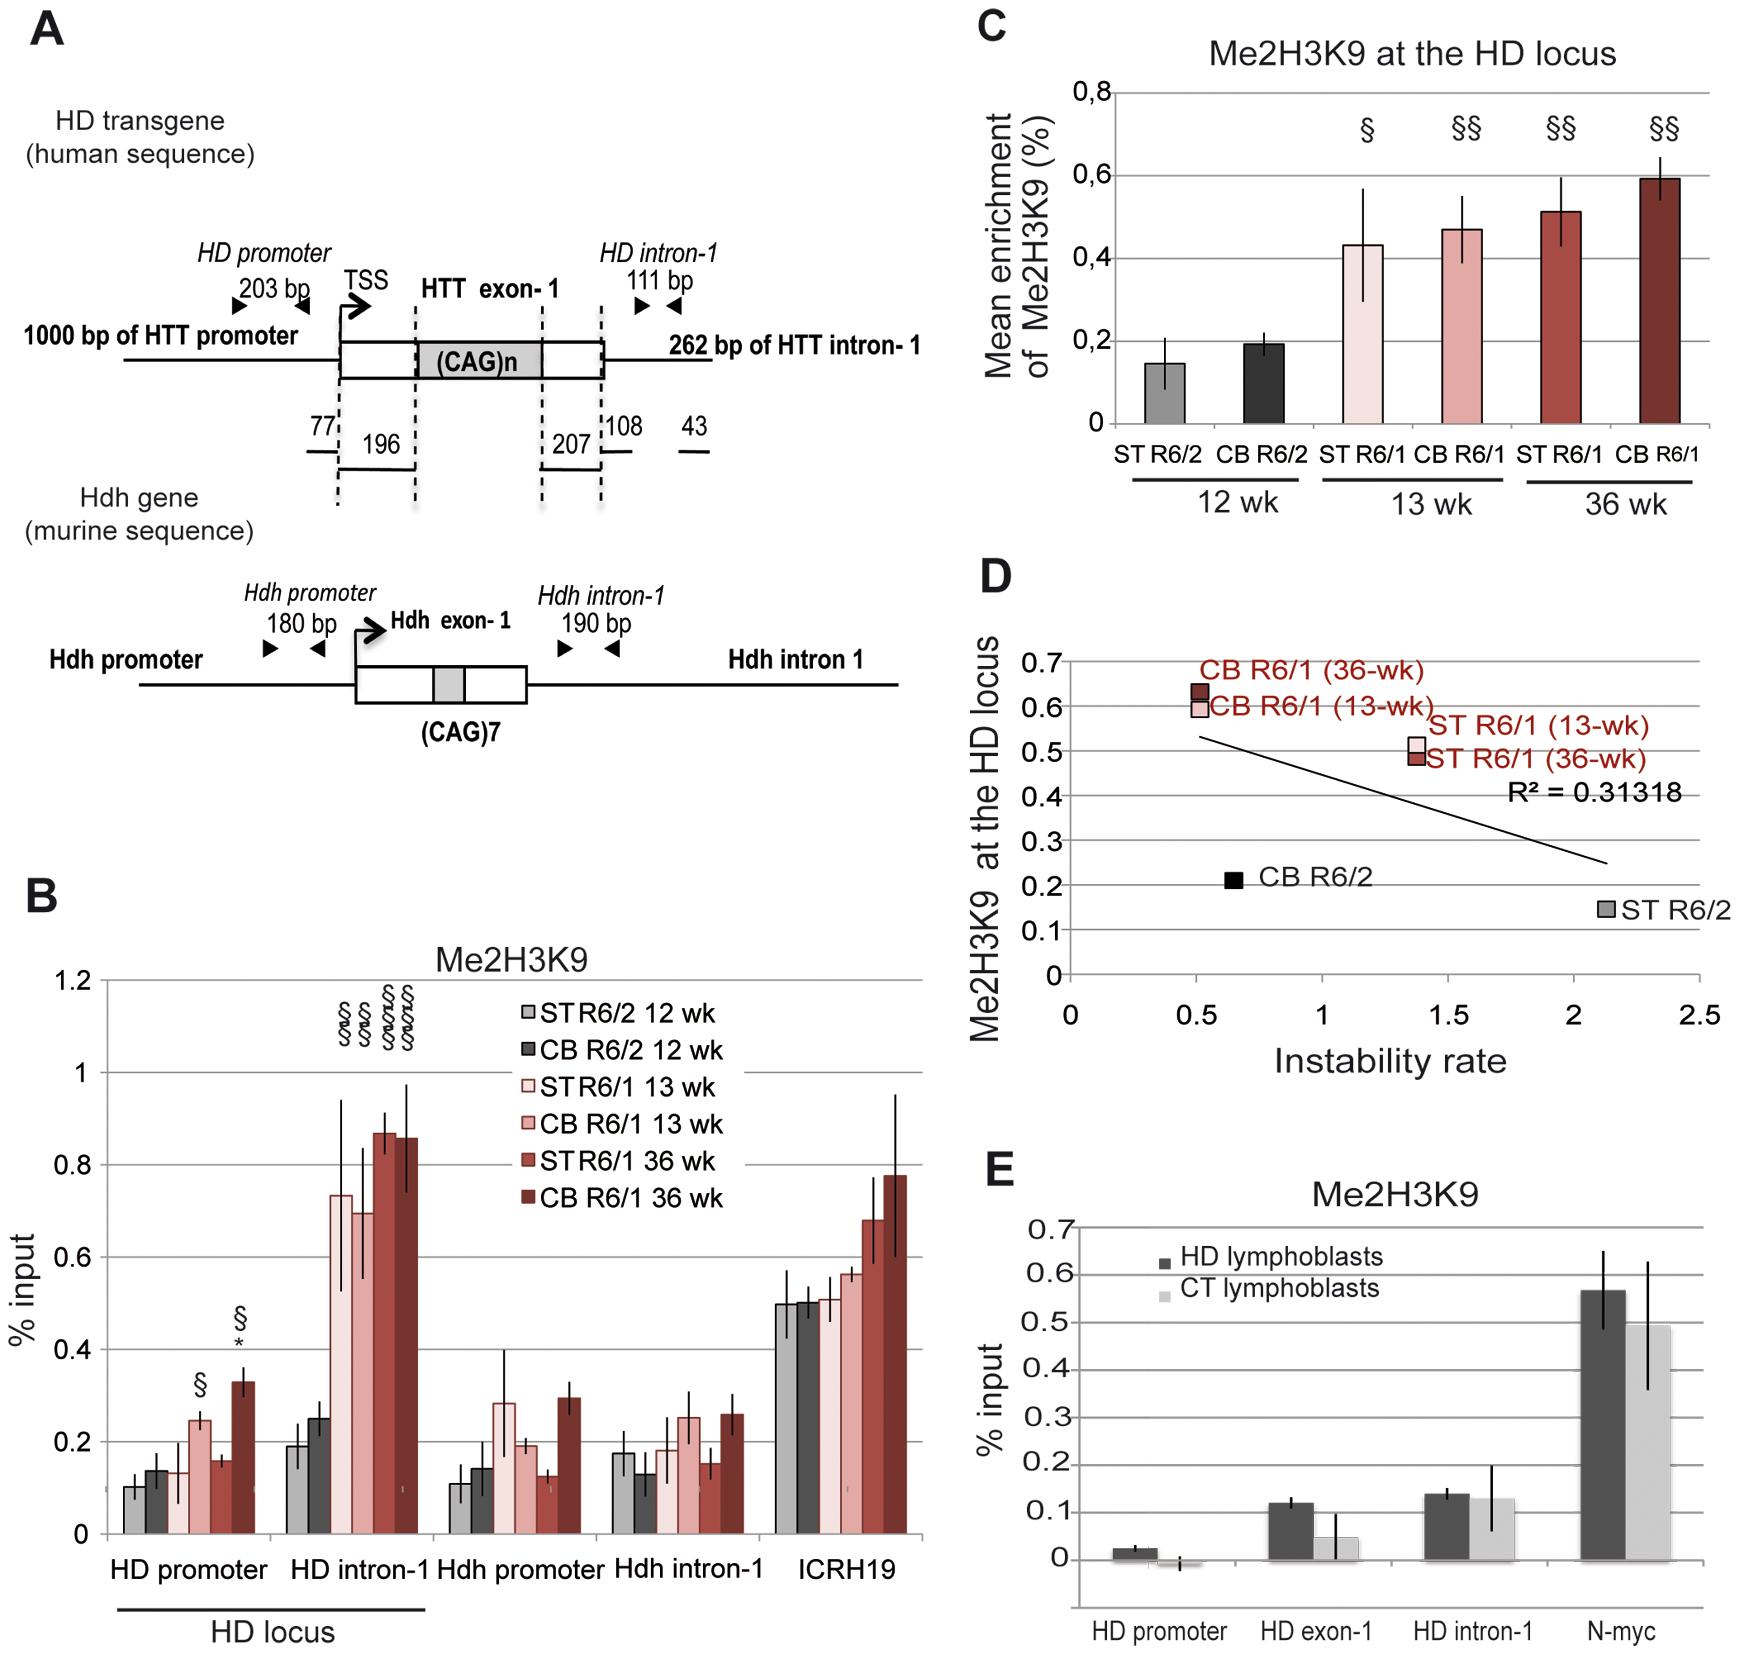 Me2H3K9 at the HD locus in R6/1 and R6/2 striatum and cerebellum.